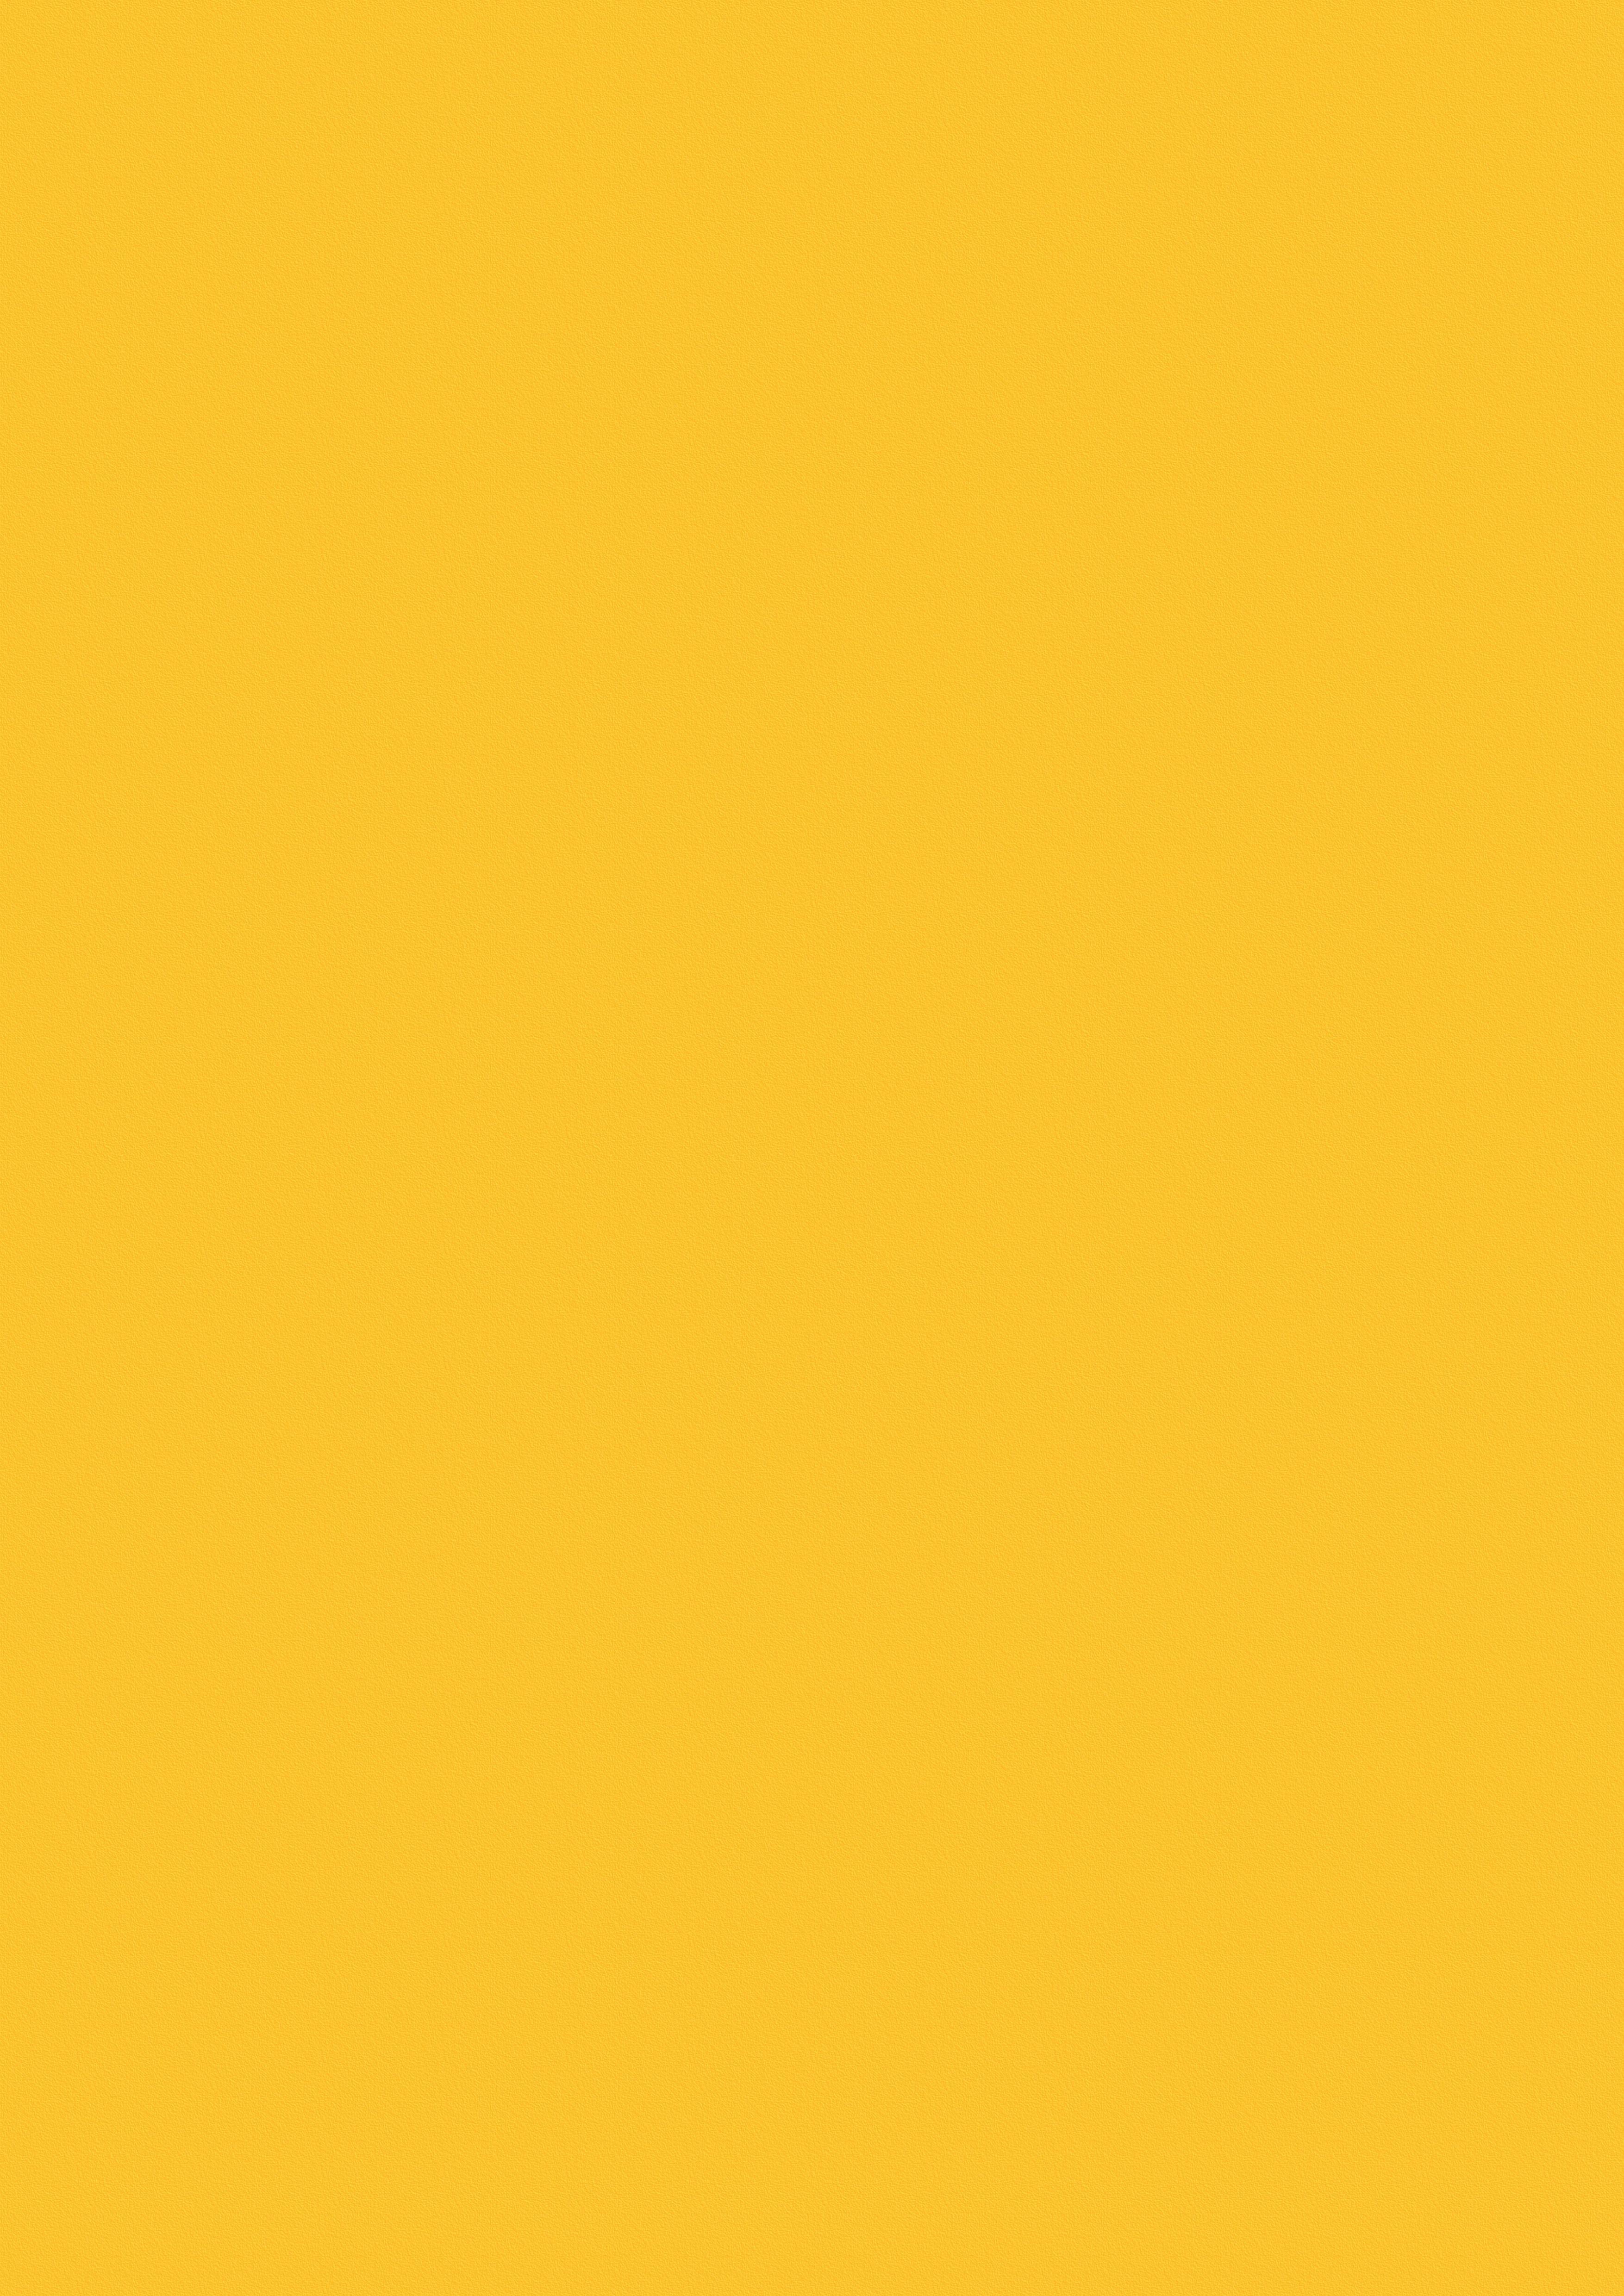 egger u114 st15 yellow ral 1023 pantone 115u ncs s0560. Black Bedroom Furniture Sets. Home Design Ideas